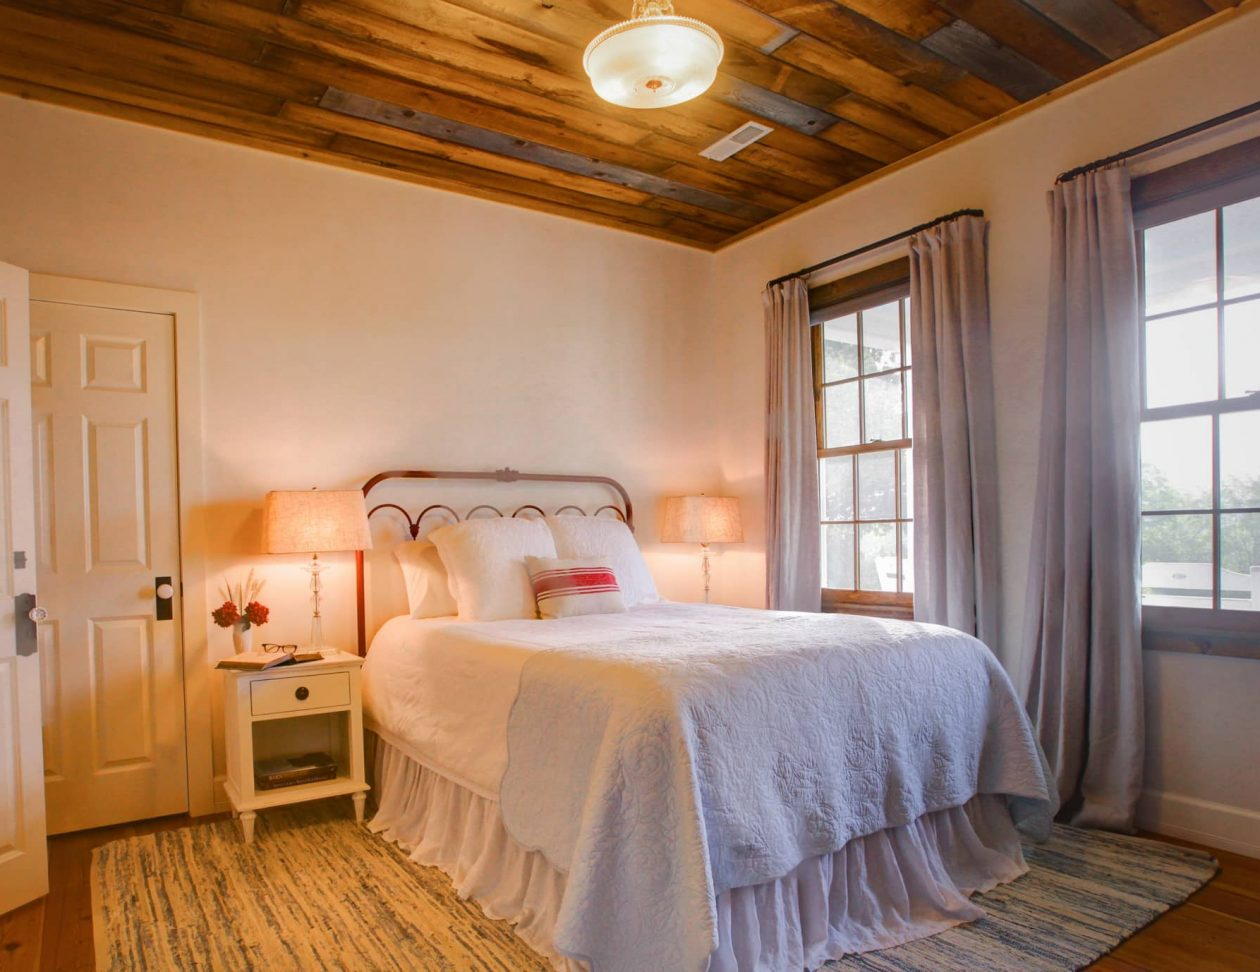 Elizabeth Paxton Suite with a queen bed and hardwood floors in Lexington, VA